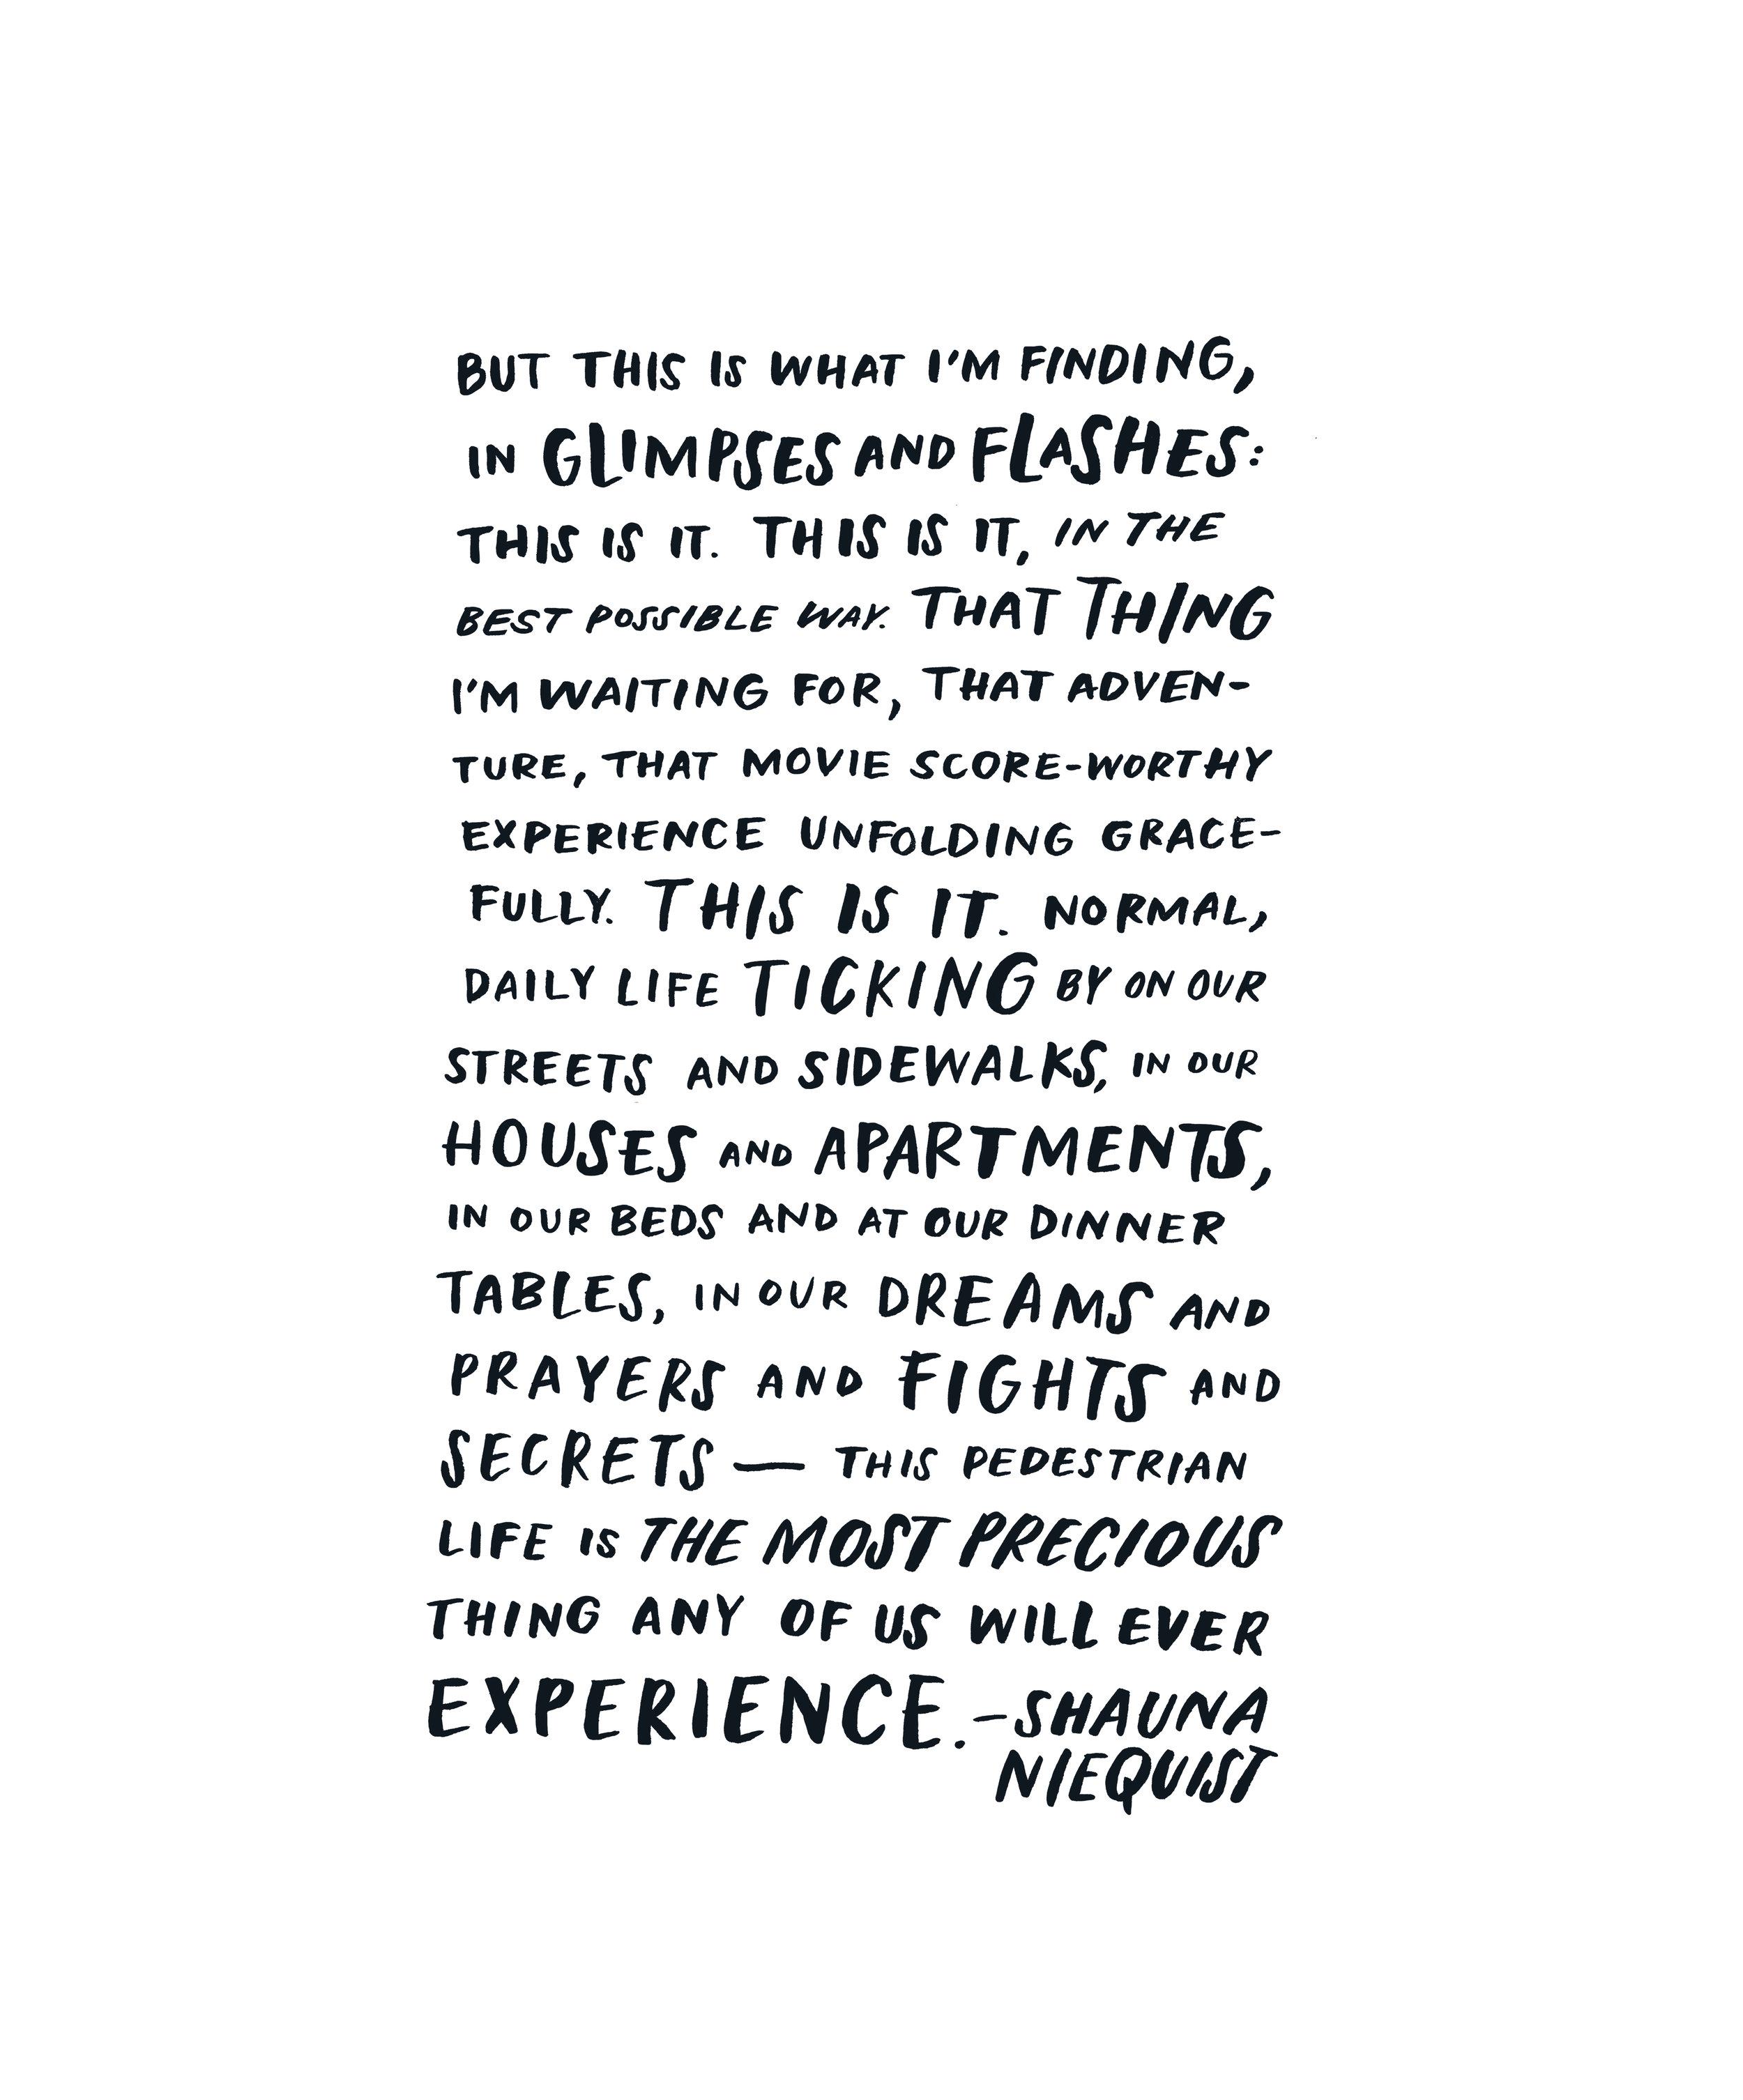 shauna quote by margot + co.jpg